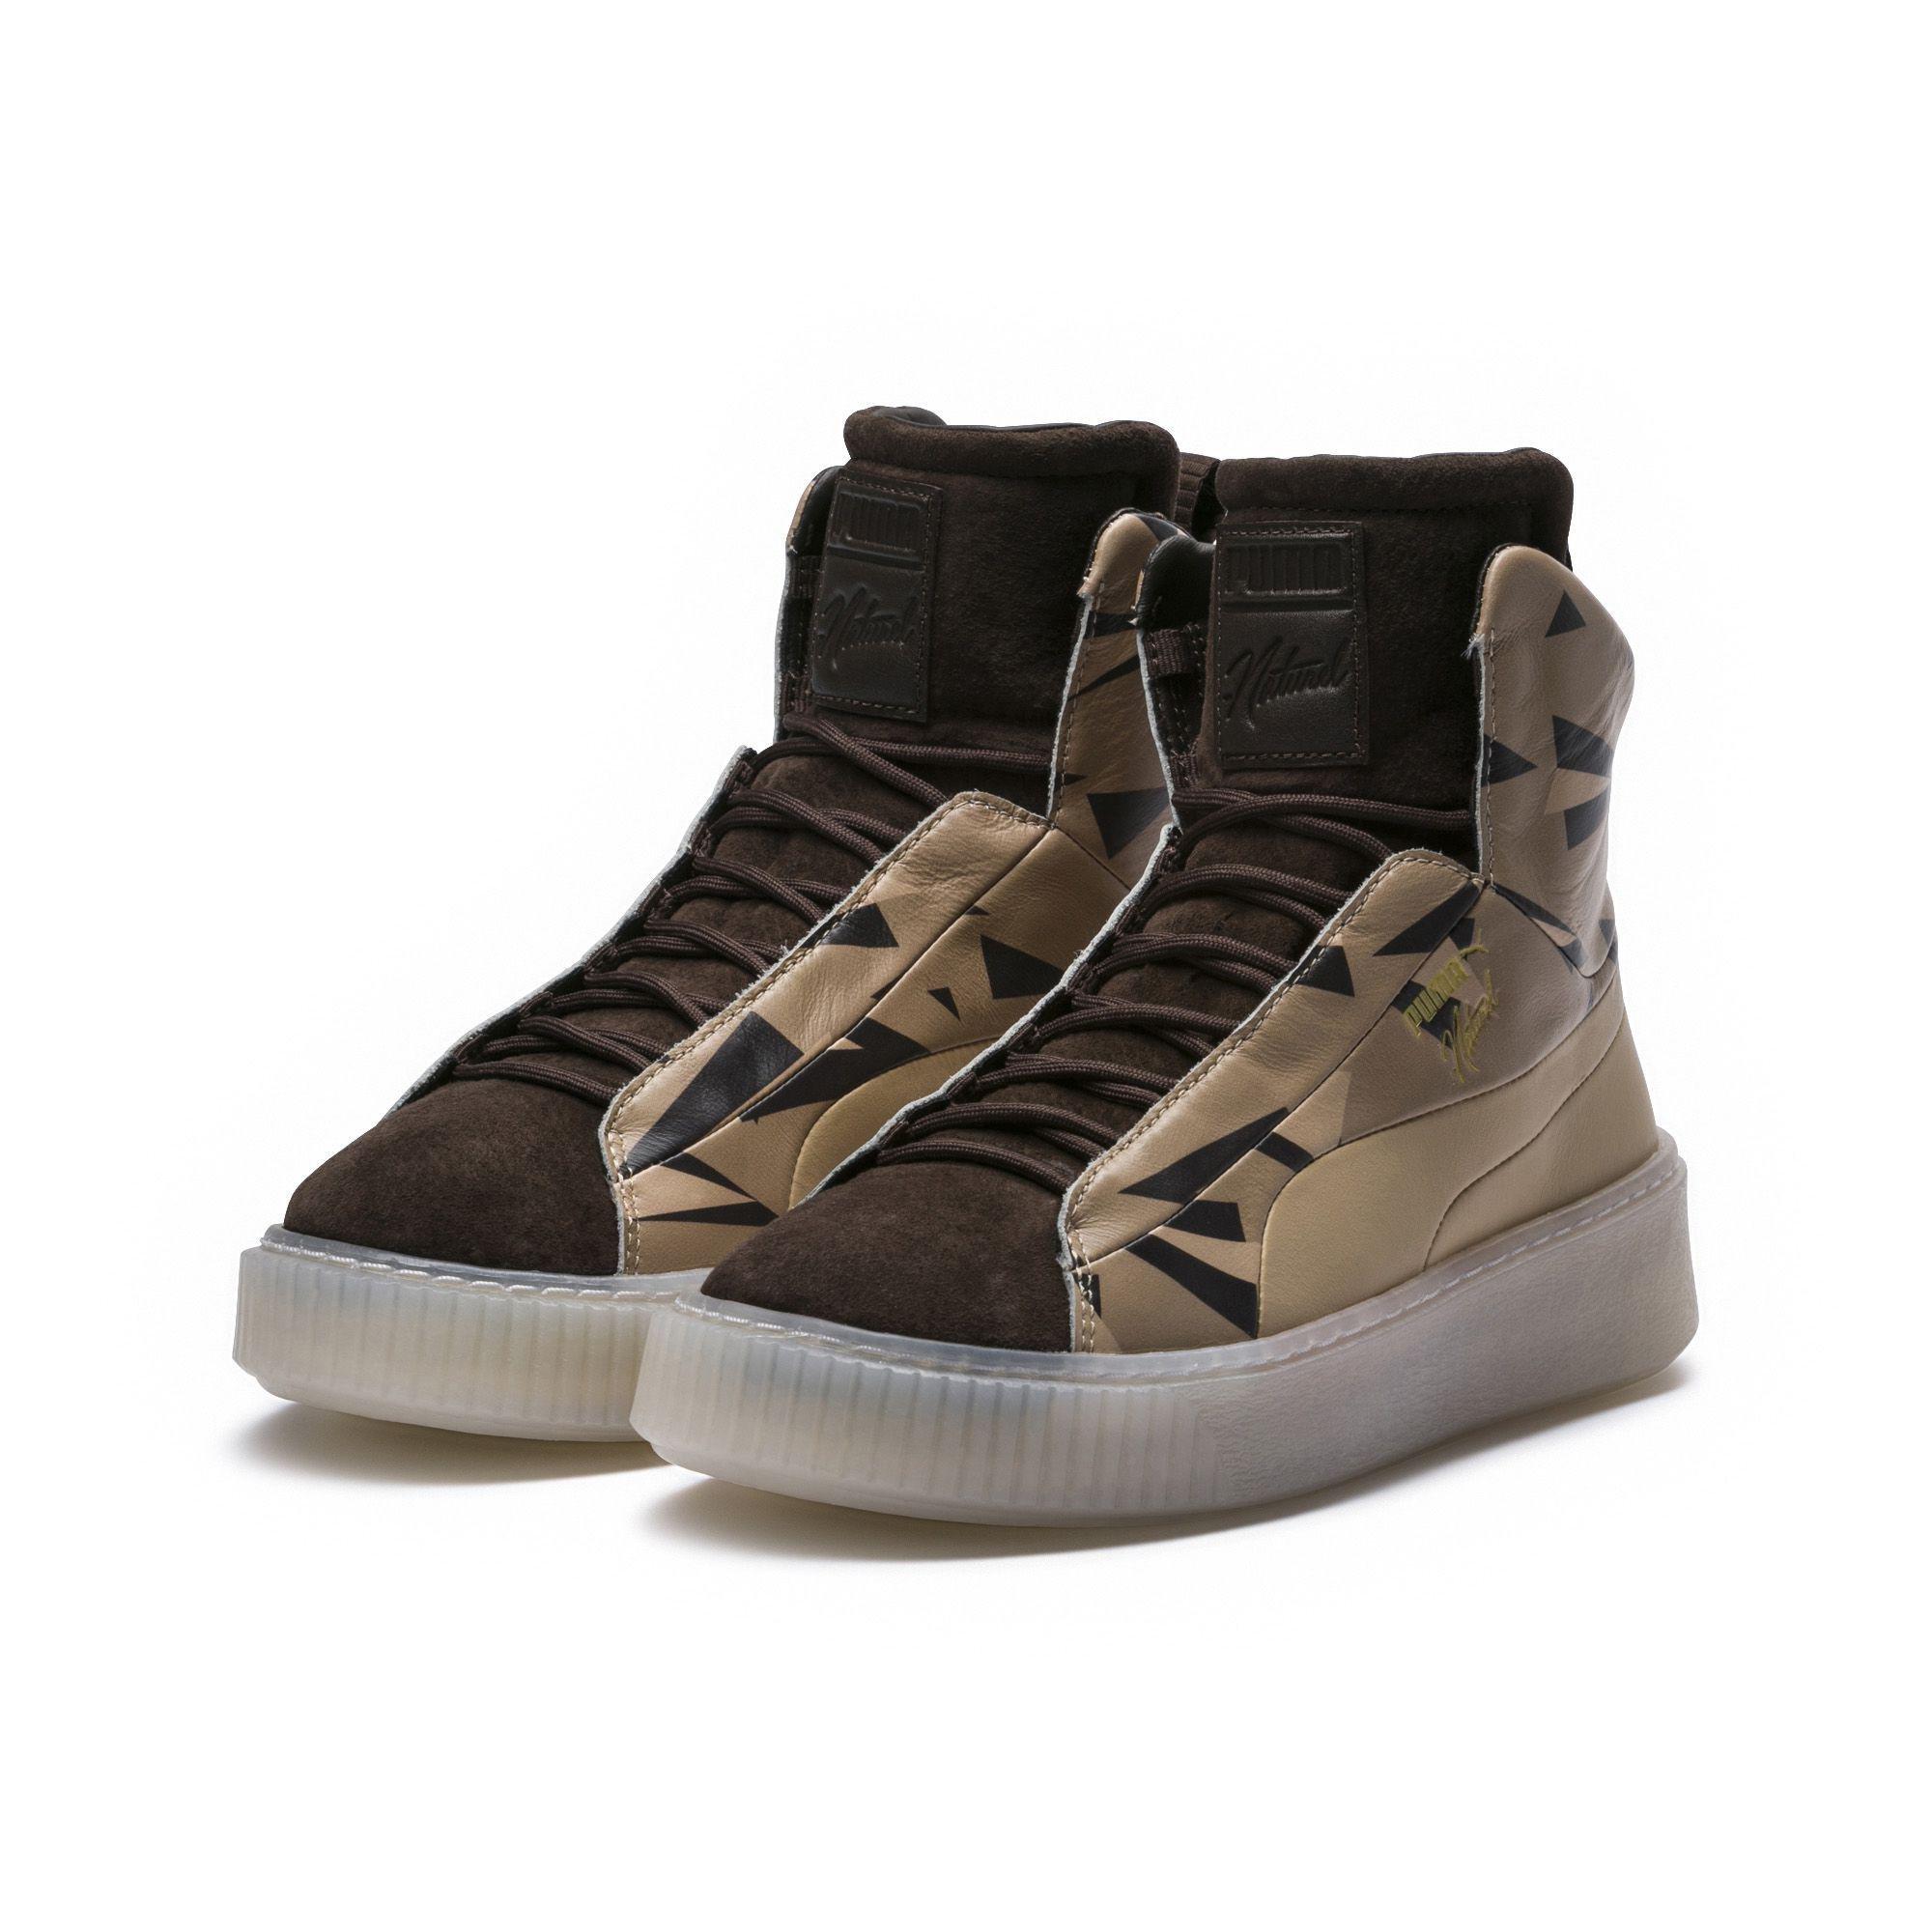 9722ac6fc520 Lyst - PUMA X Naturel Platform Fshn Cheetah Women s Sneakers in Brown